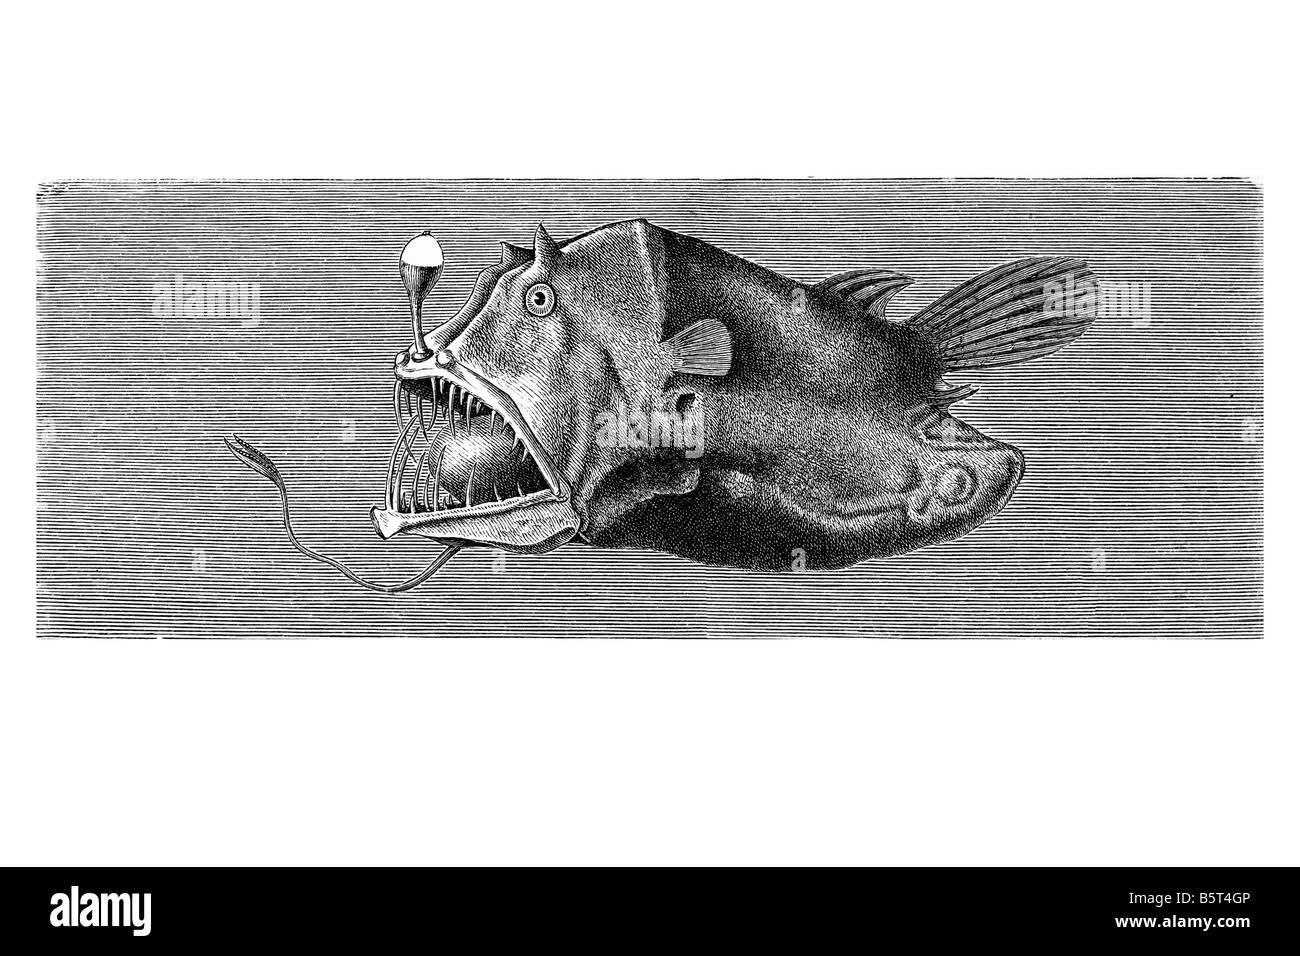 Anglerfishes Leftvent netdevil Borophryne apogon piccolo profondo mare pesce lophiiform famiglia Linophrynidae mimetismo Immagini Stock